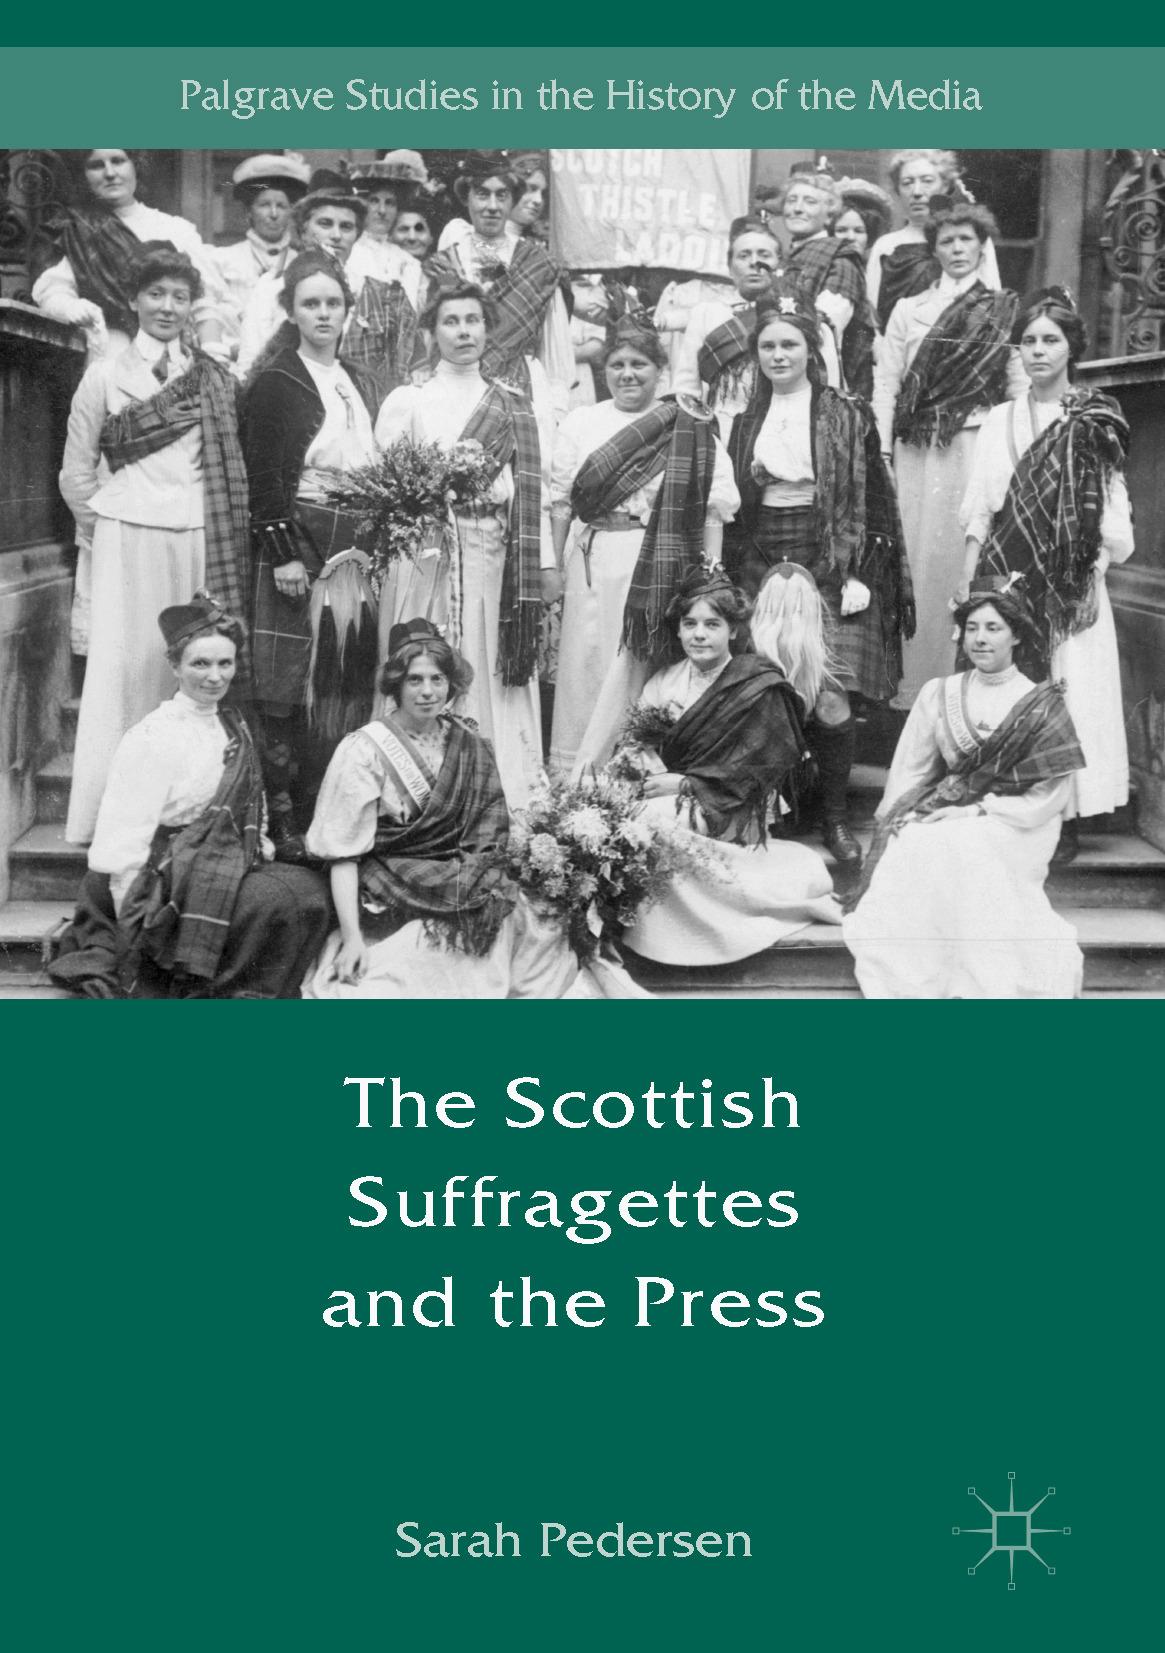 Pedersen, Sarah - The Scottish Suffragettes and the Press, ebook